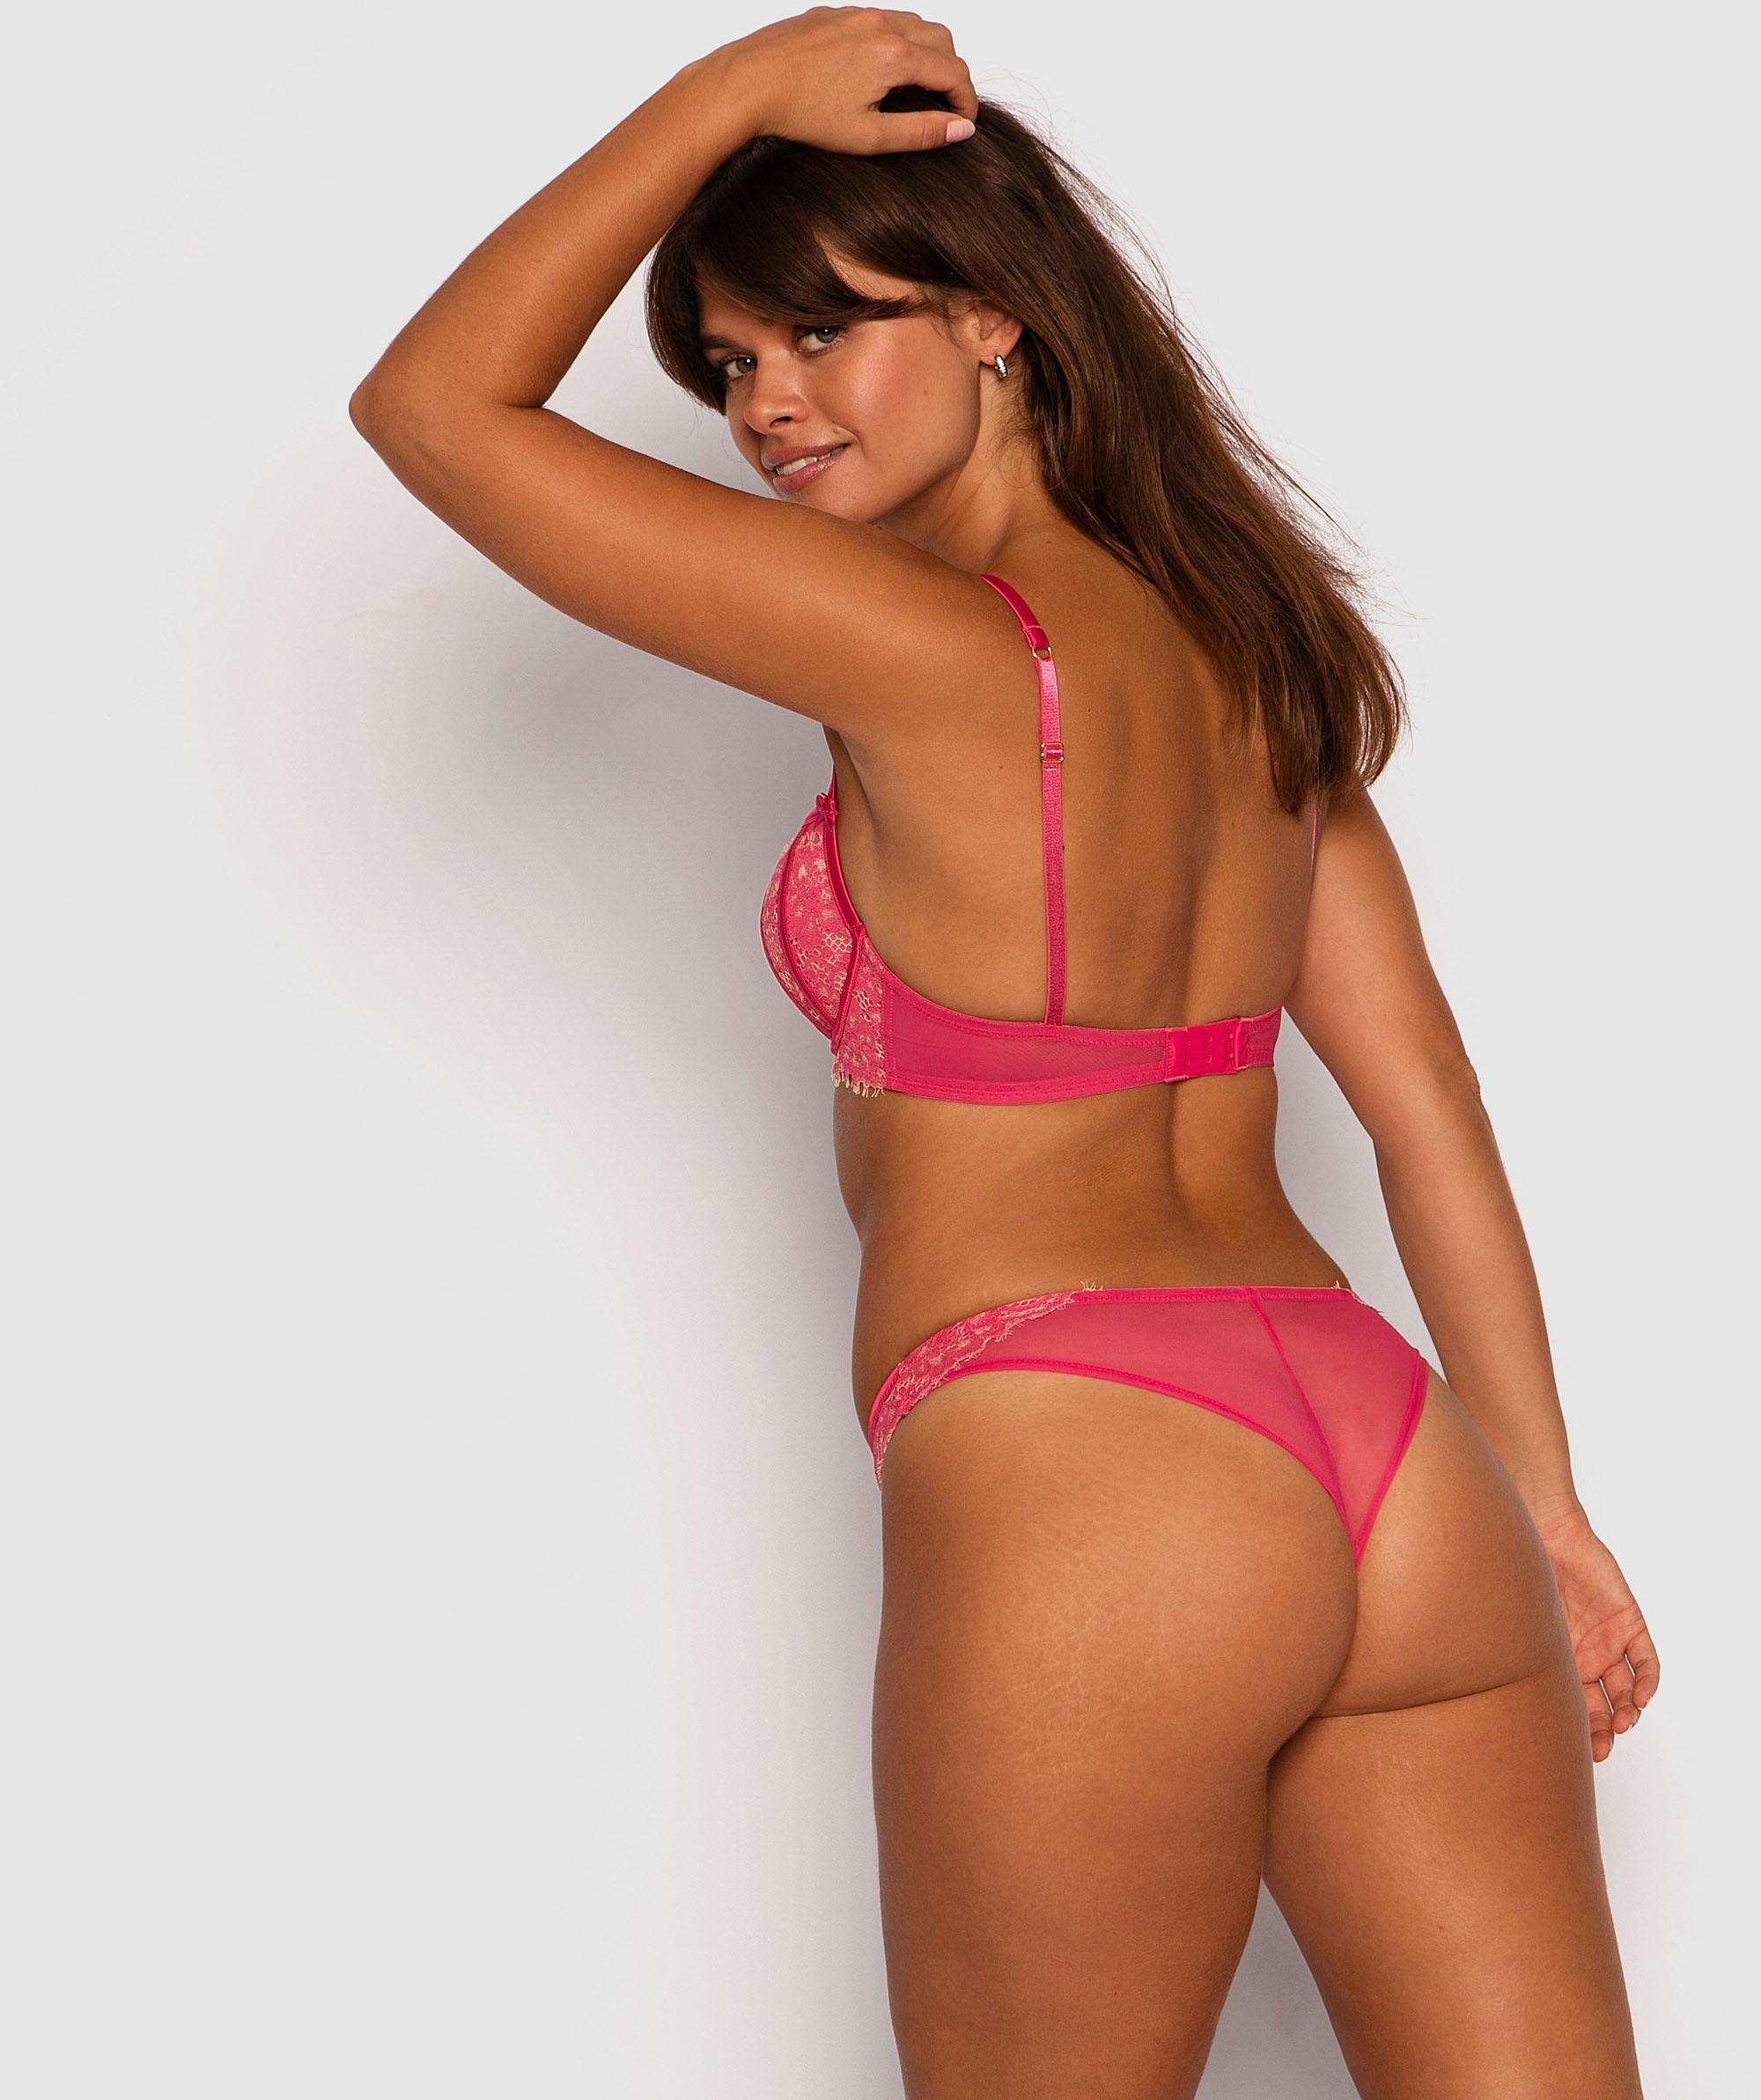 Karina Brazilian Knicker - Dark Pink/Nude